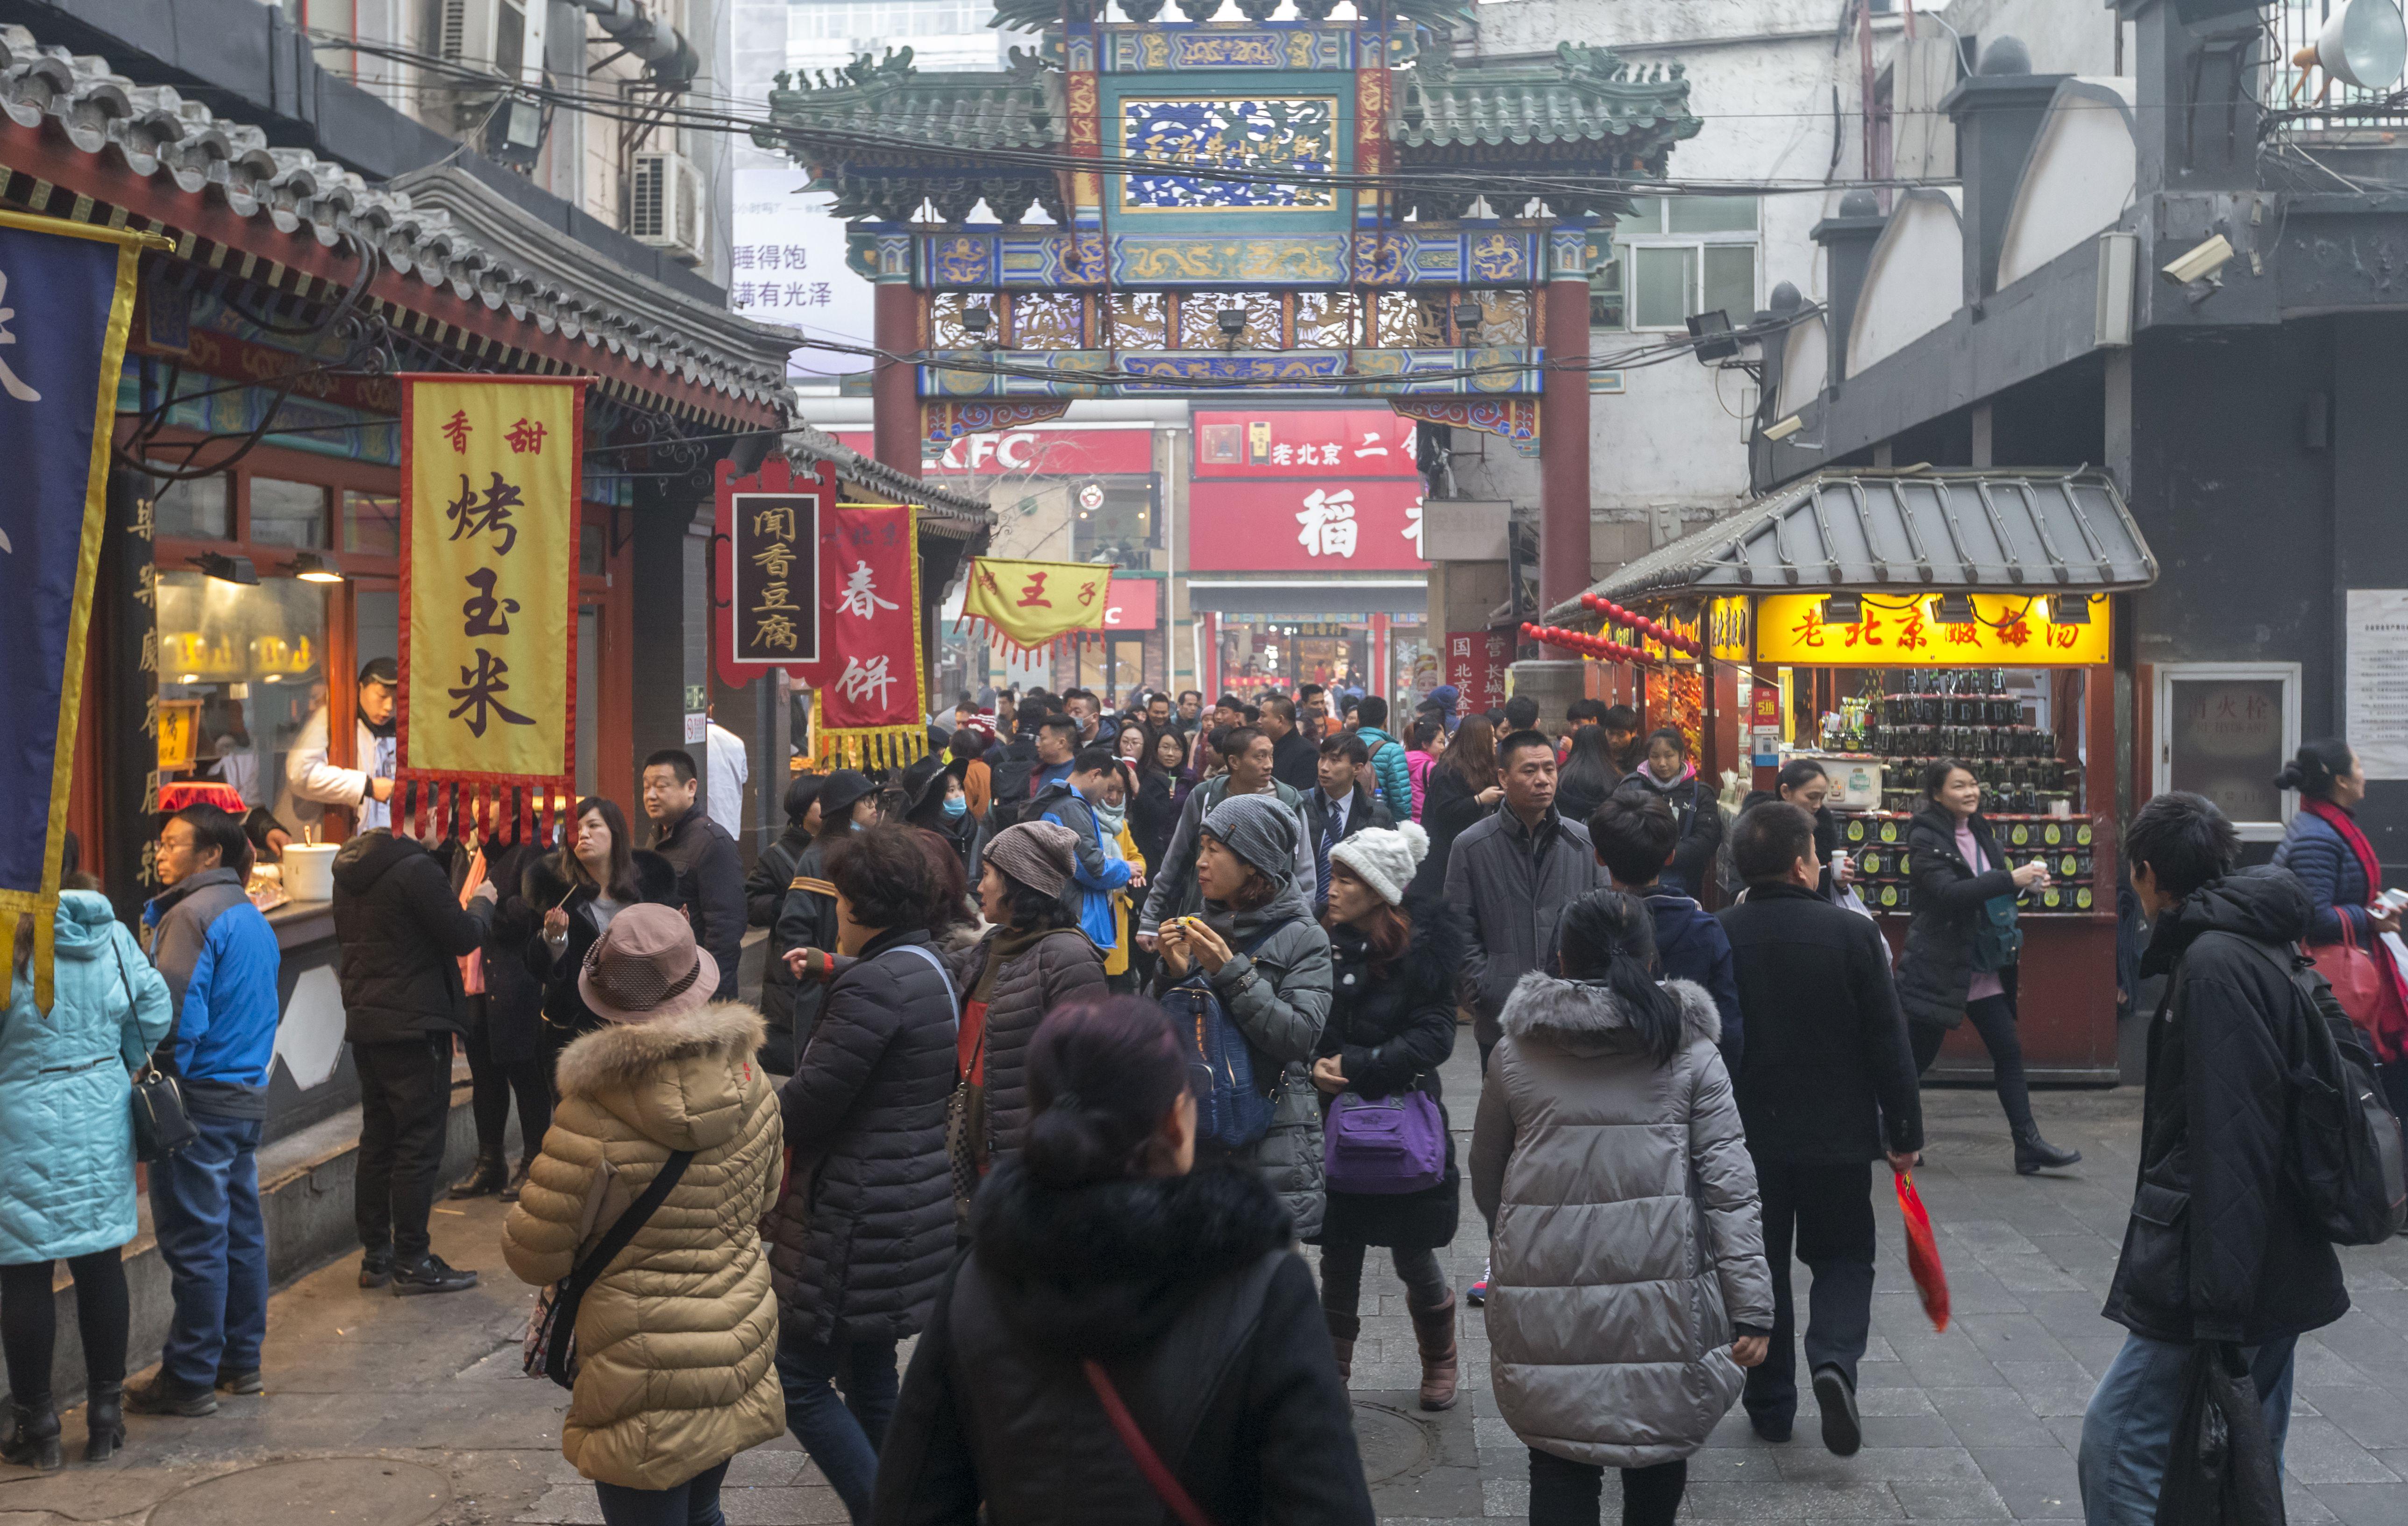 Pedestrians on Wangfujing Street, a shopping and snacking street in Beijing